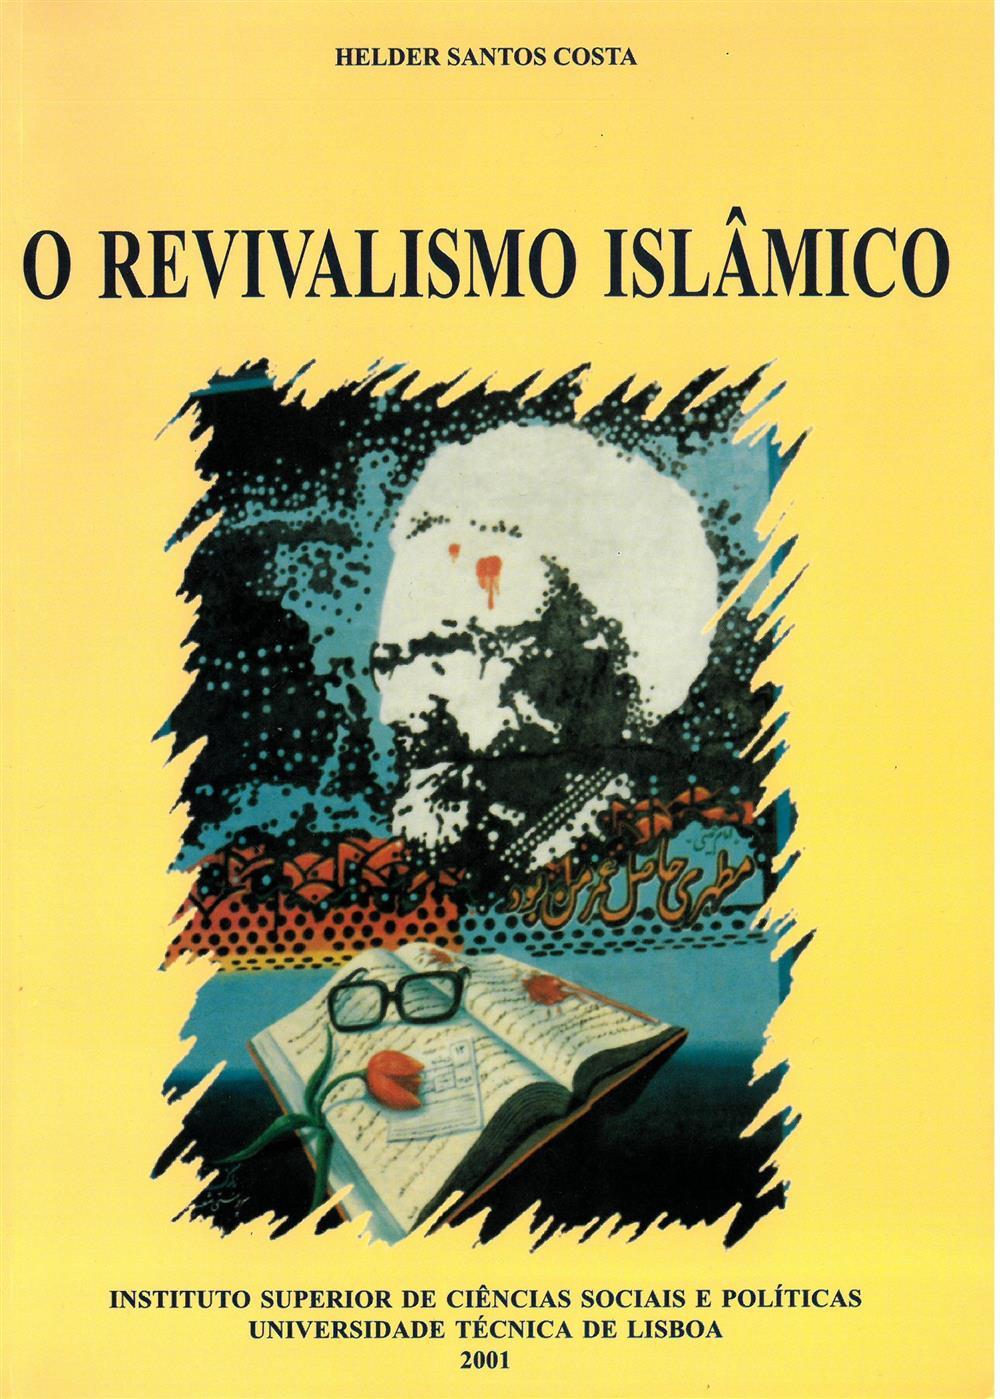 O revivalismo islâmico.jpg